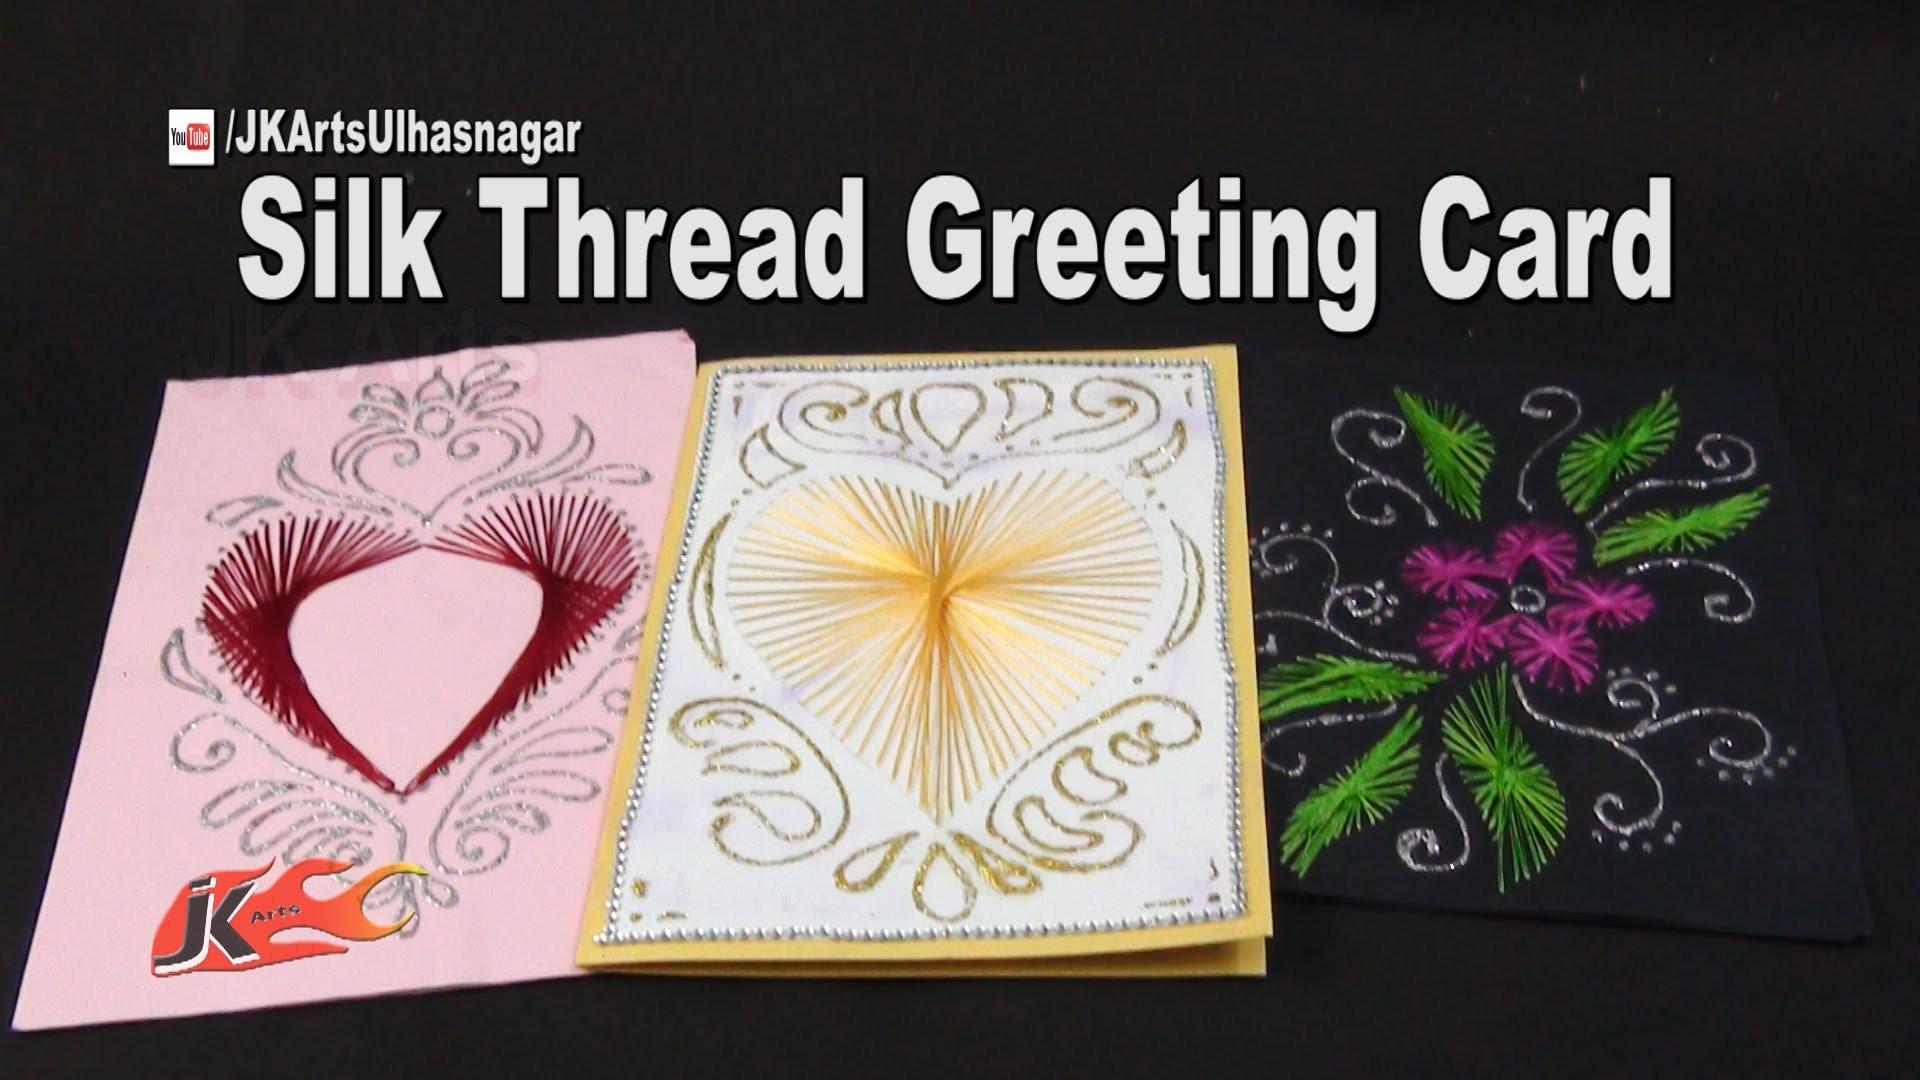 Beautiful String Art Heart Card | Silk Thread Greeting Card | How to make | JK Arts 966